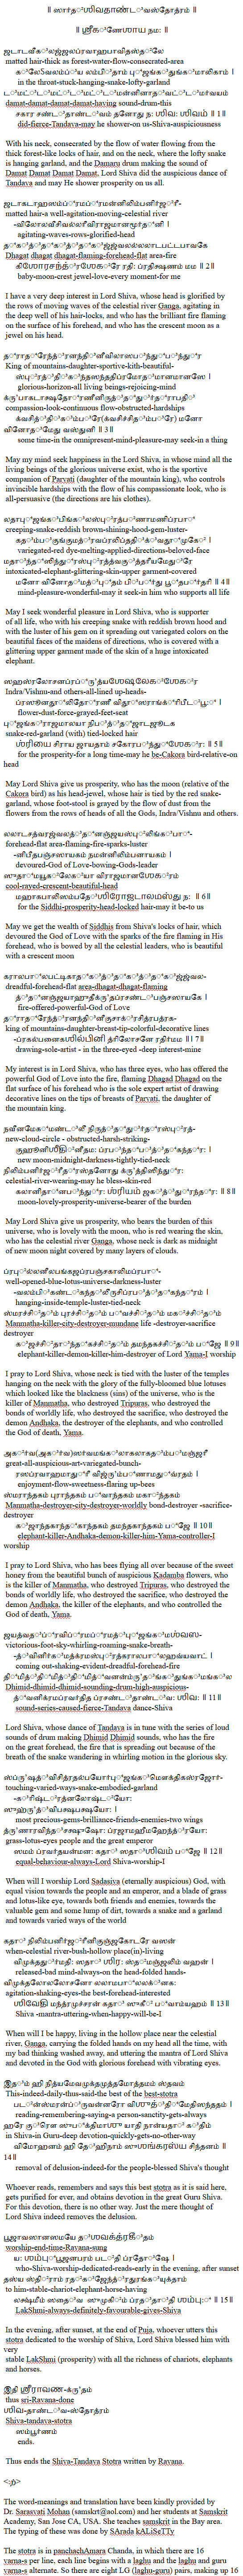 shiva tandava stotram lyrics in tamil